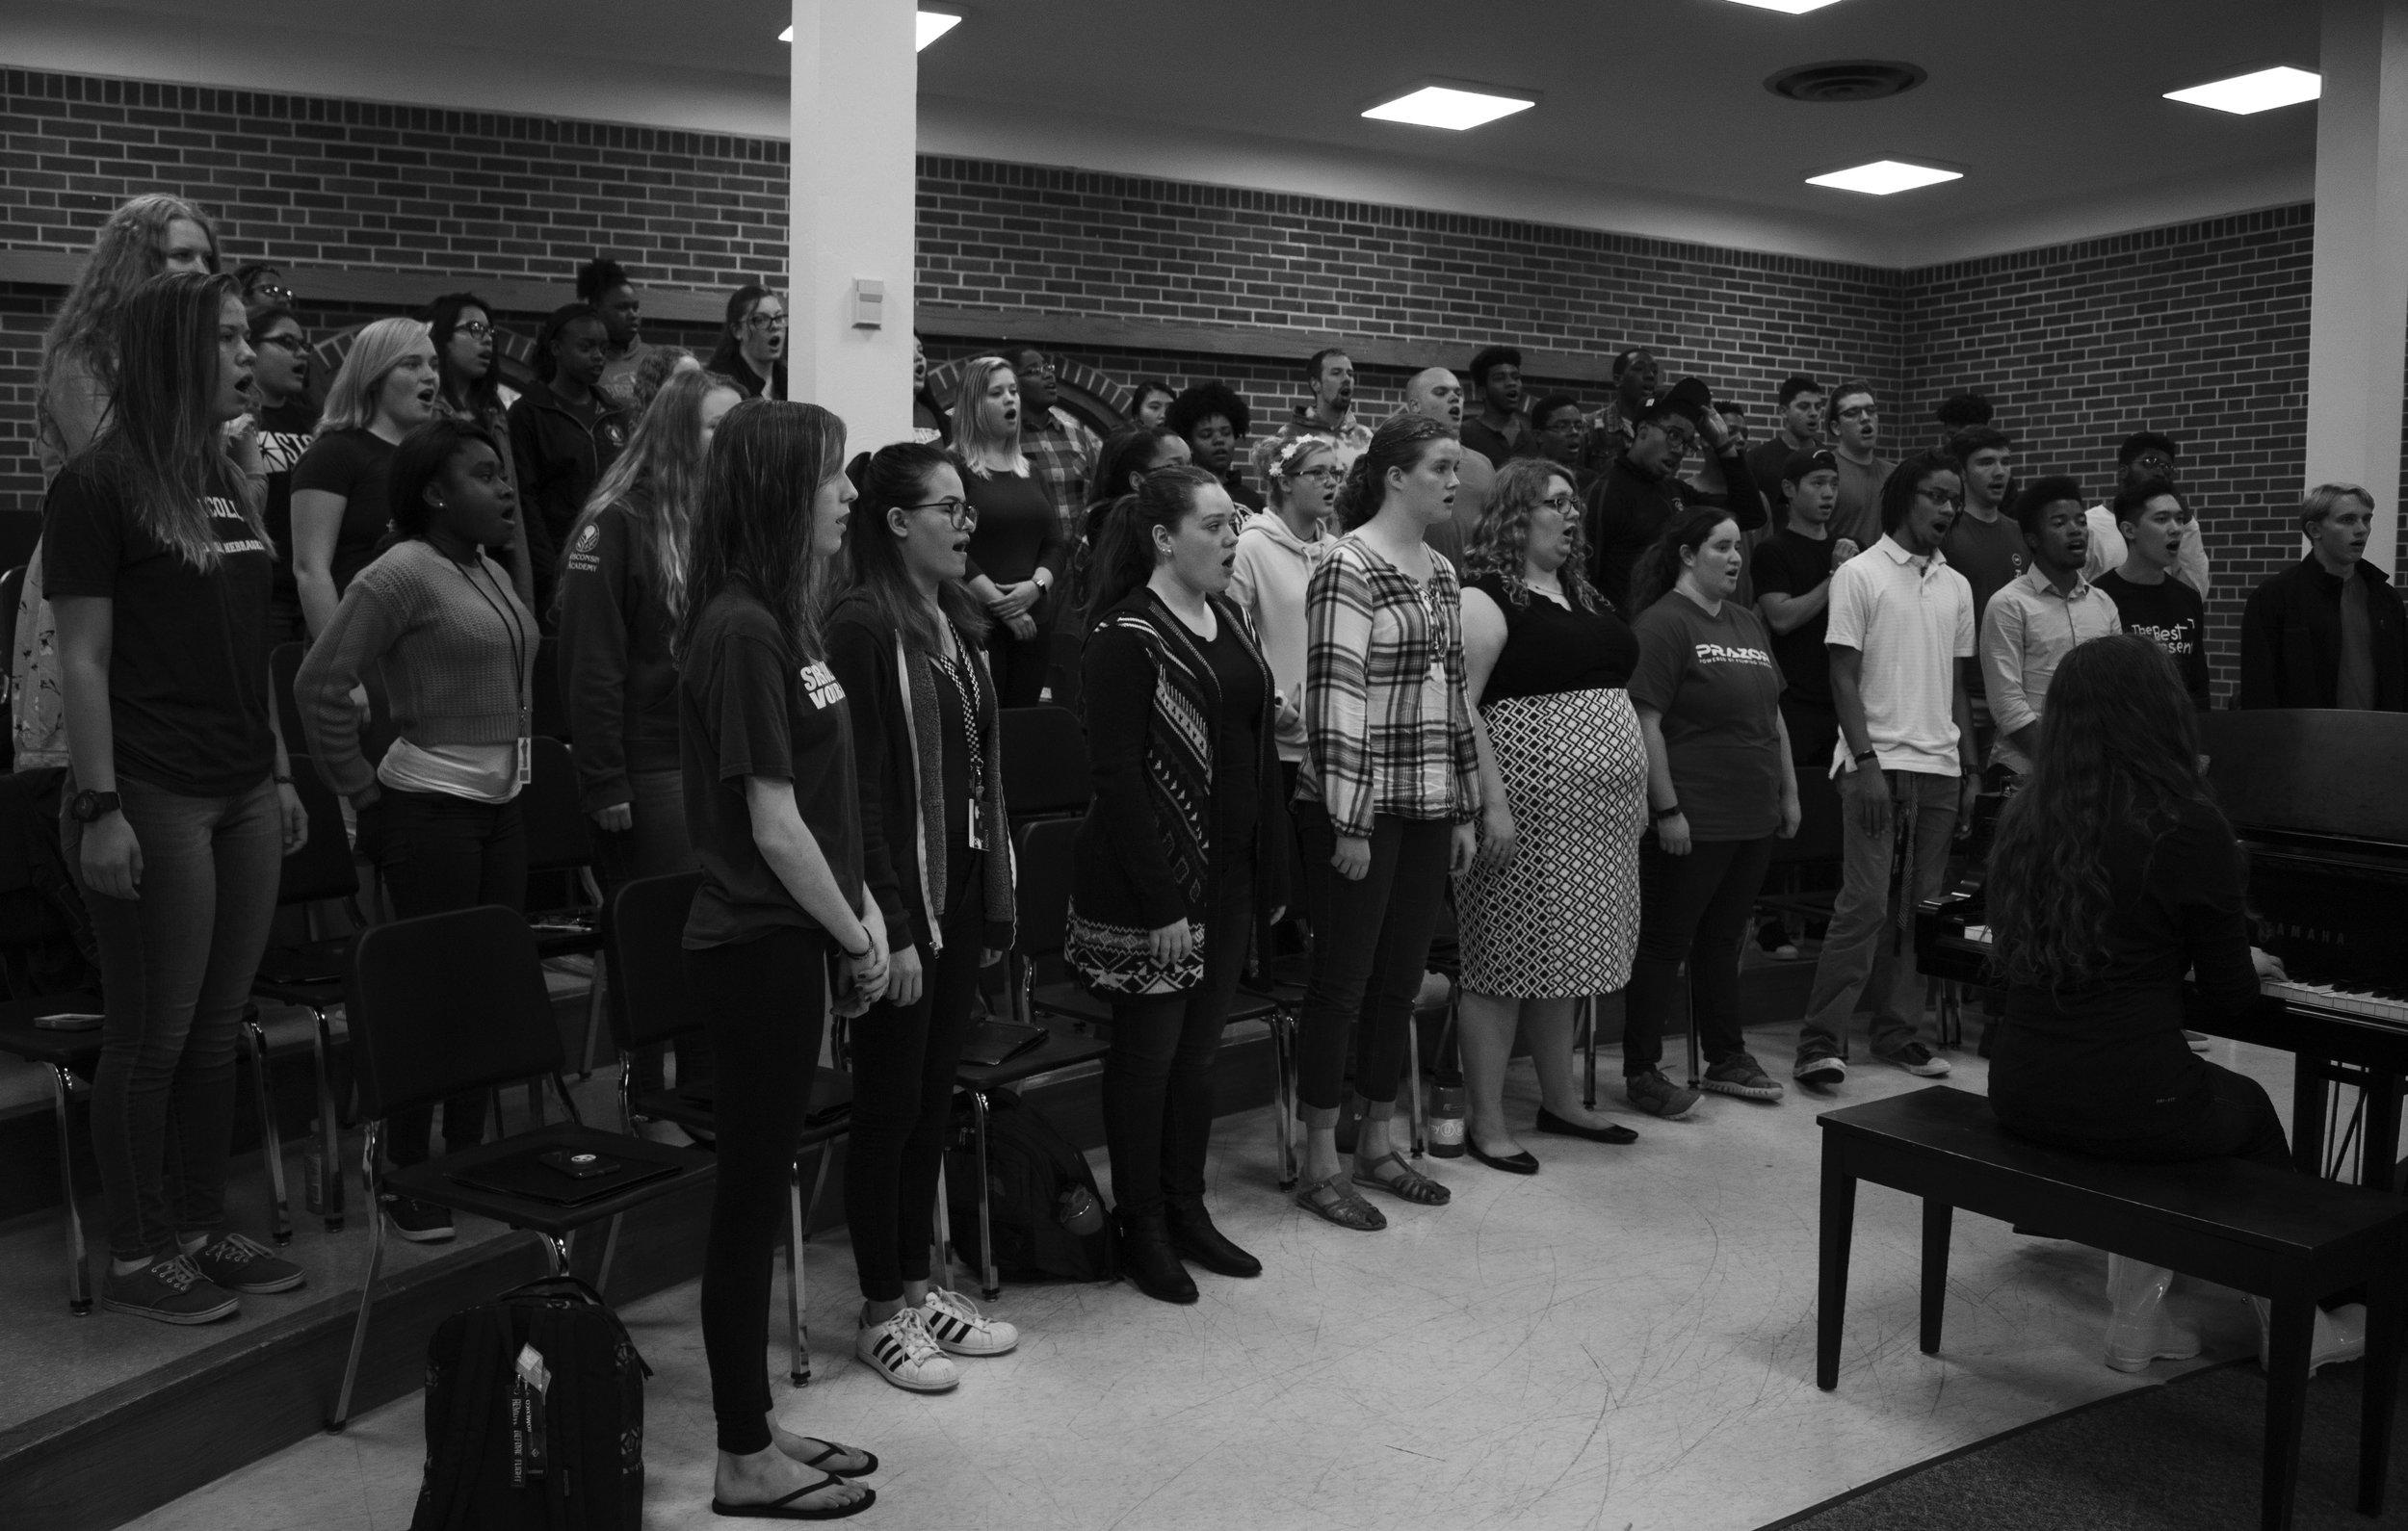 The Unionaires embrace Lincoln's music culture. PC: Kayla Potts